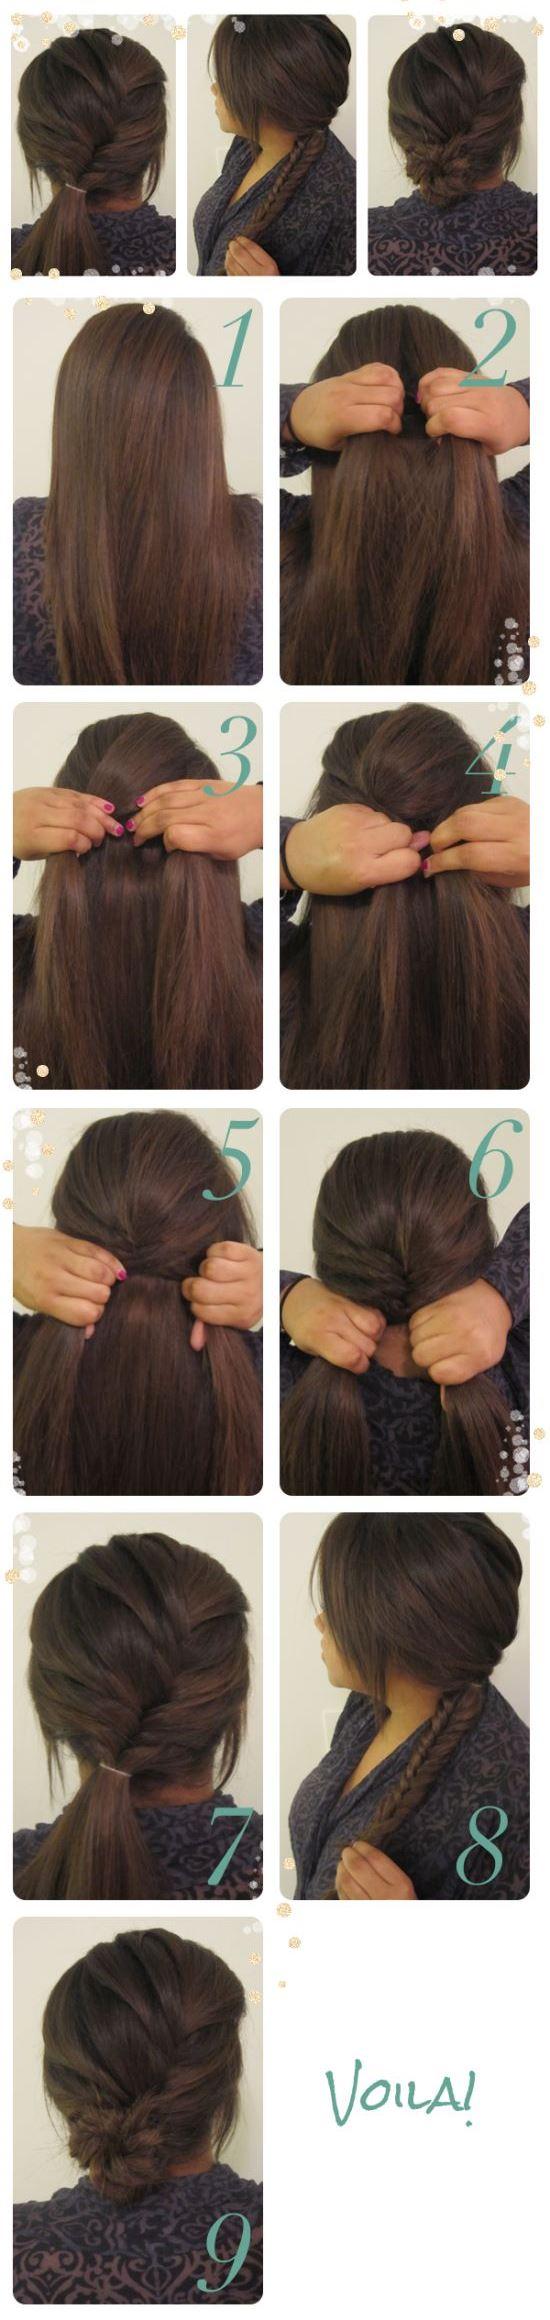 cabelo cauda de sereia